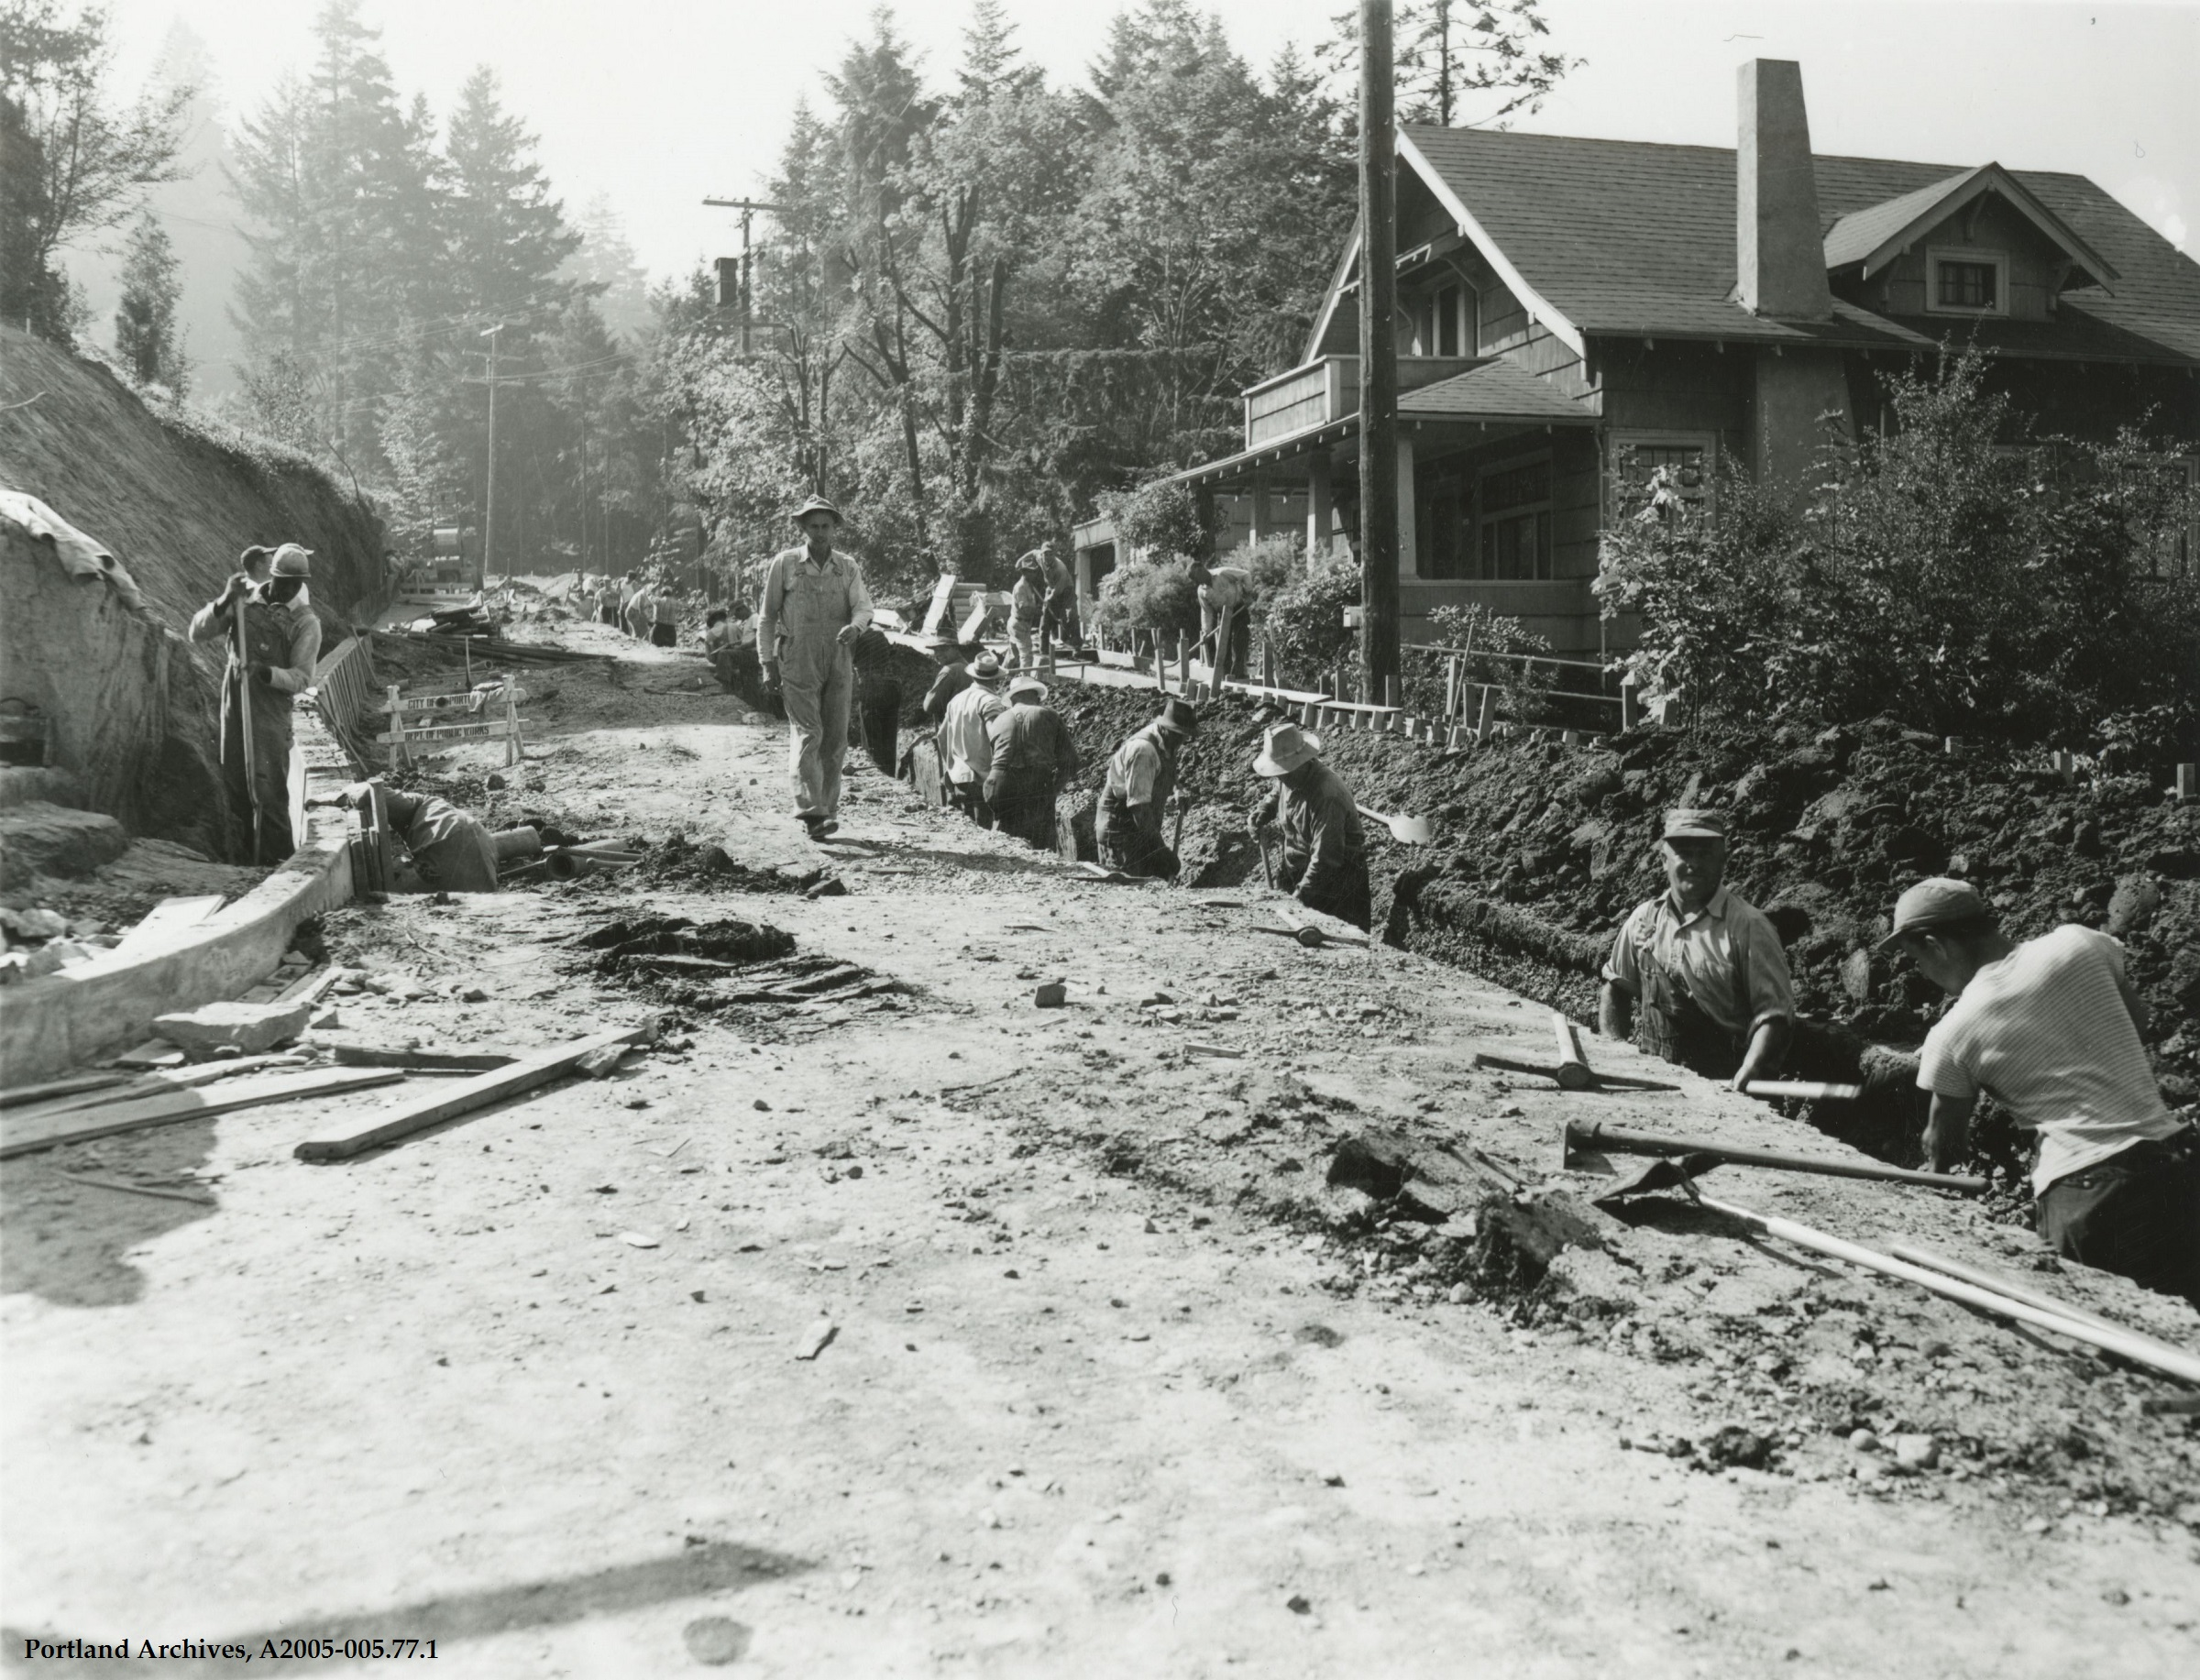 City of Portland Archives, Oregon, A2005-005.77.1